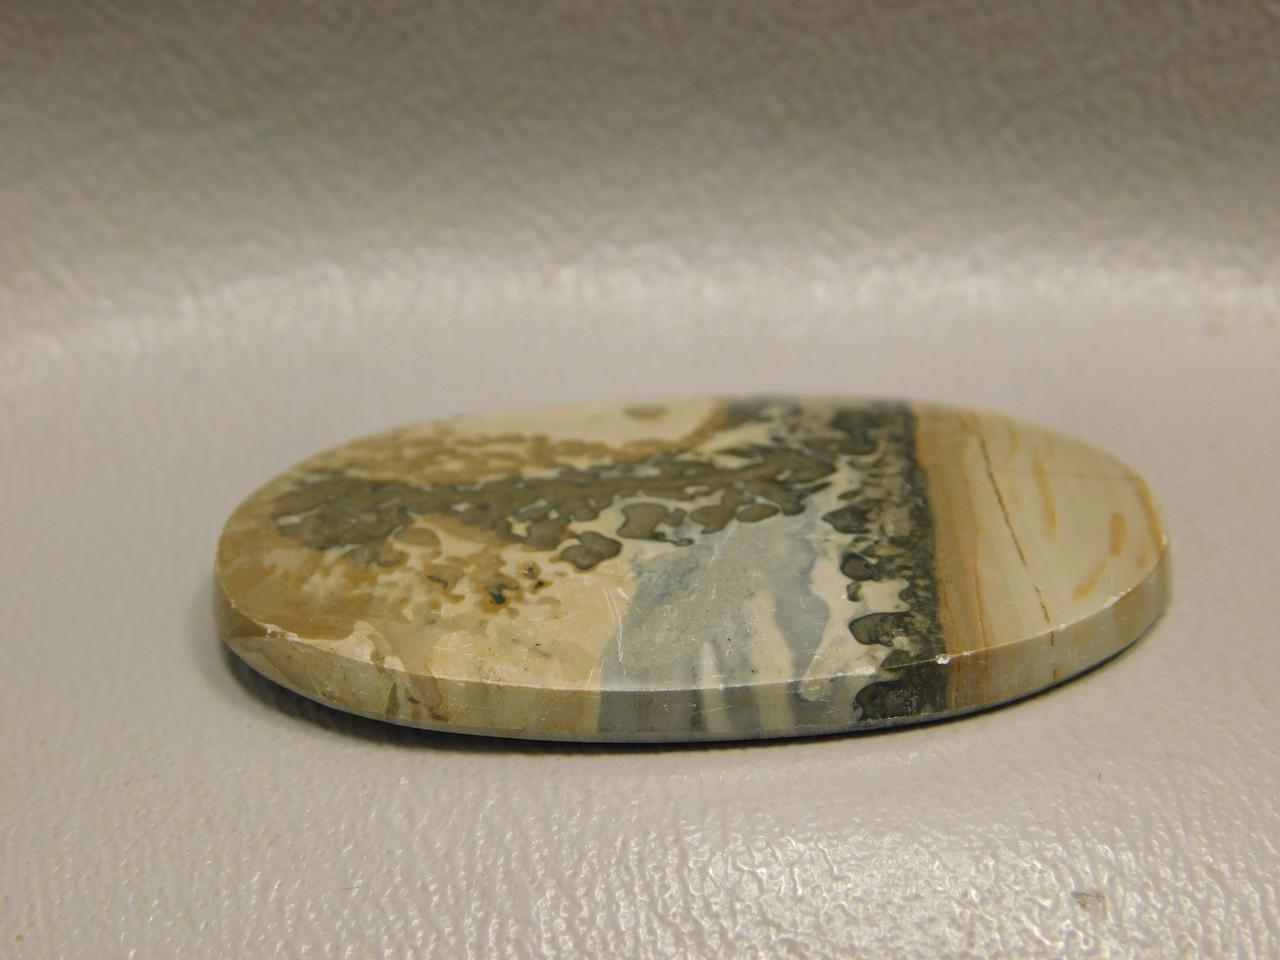 Cotham Marble Fossil Stromatolite Stone Cabochon England #12